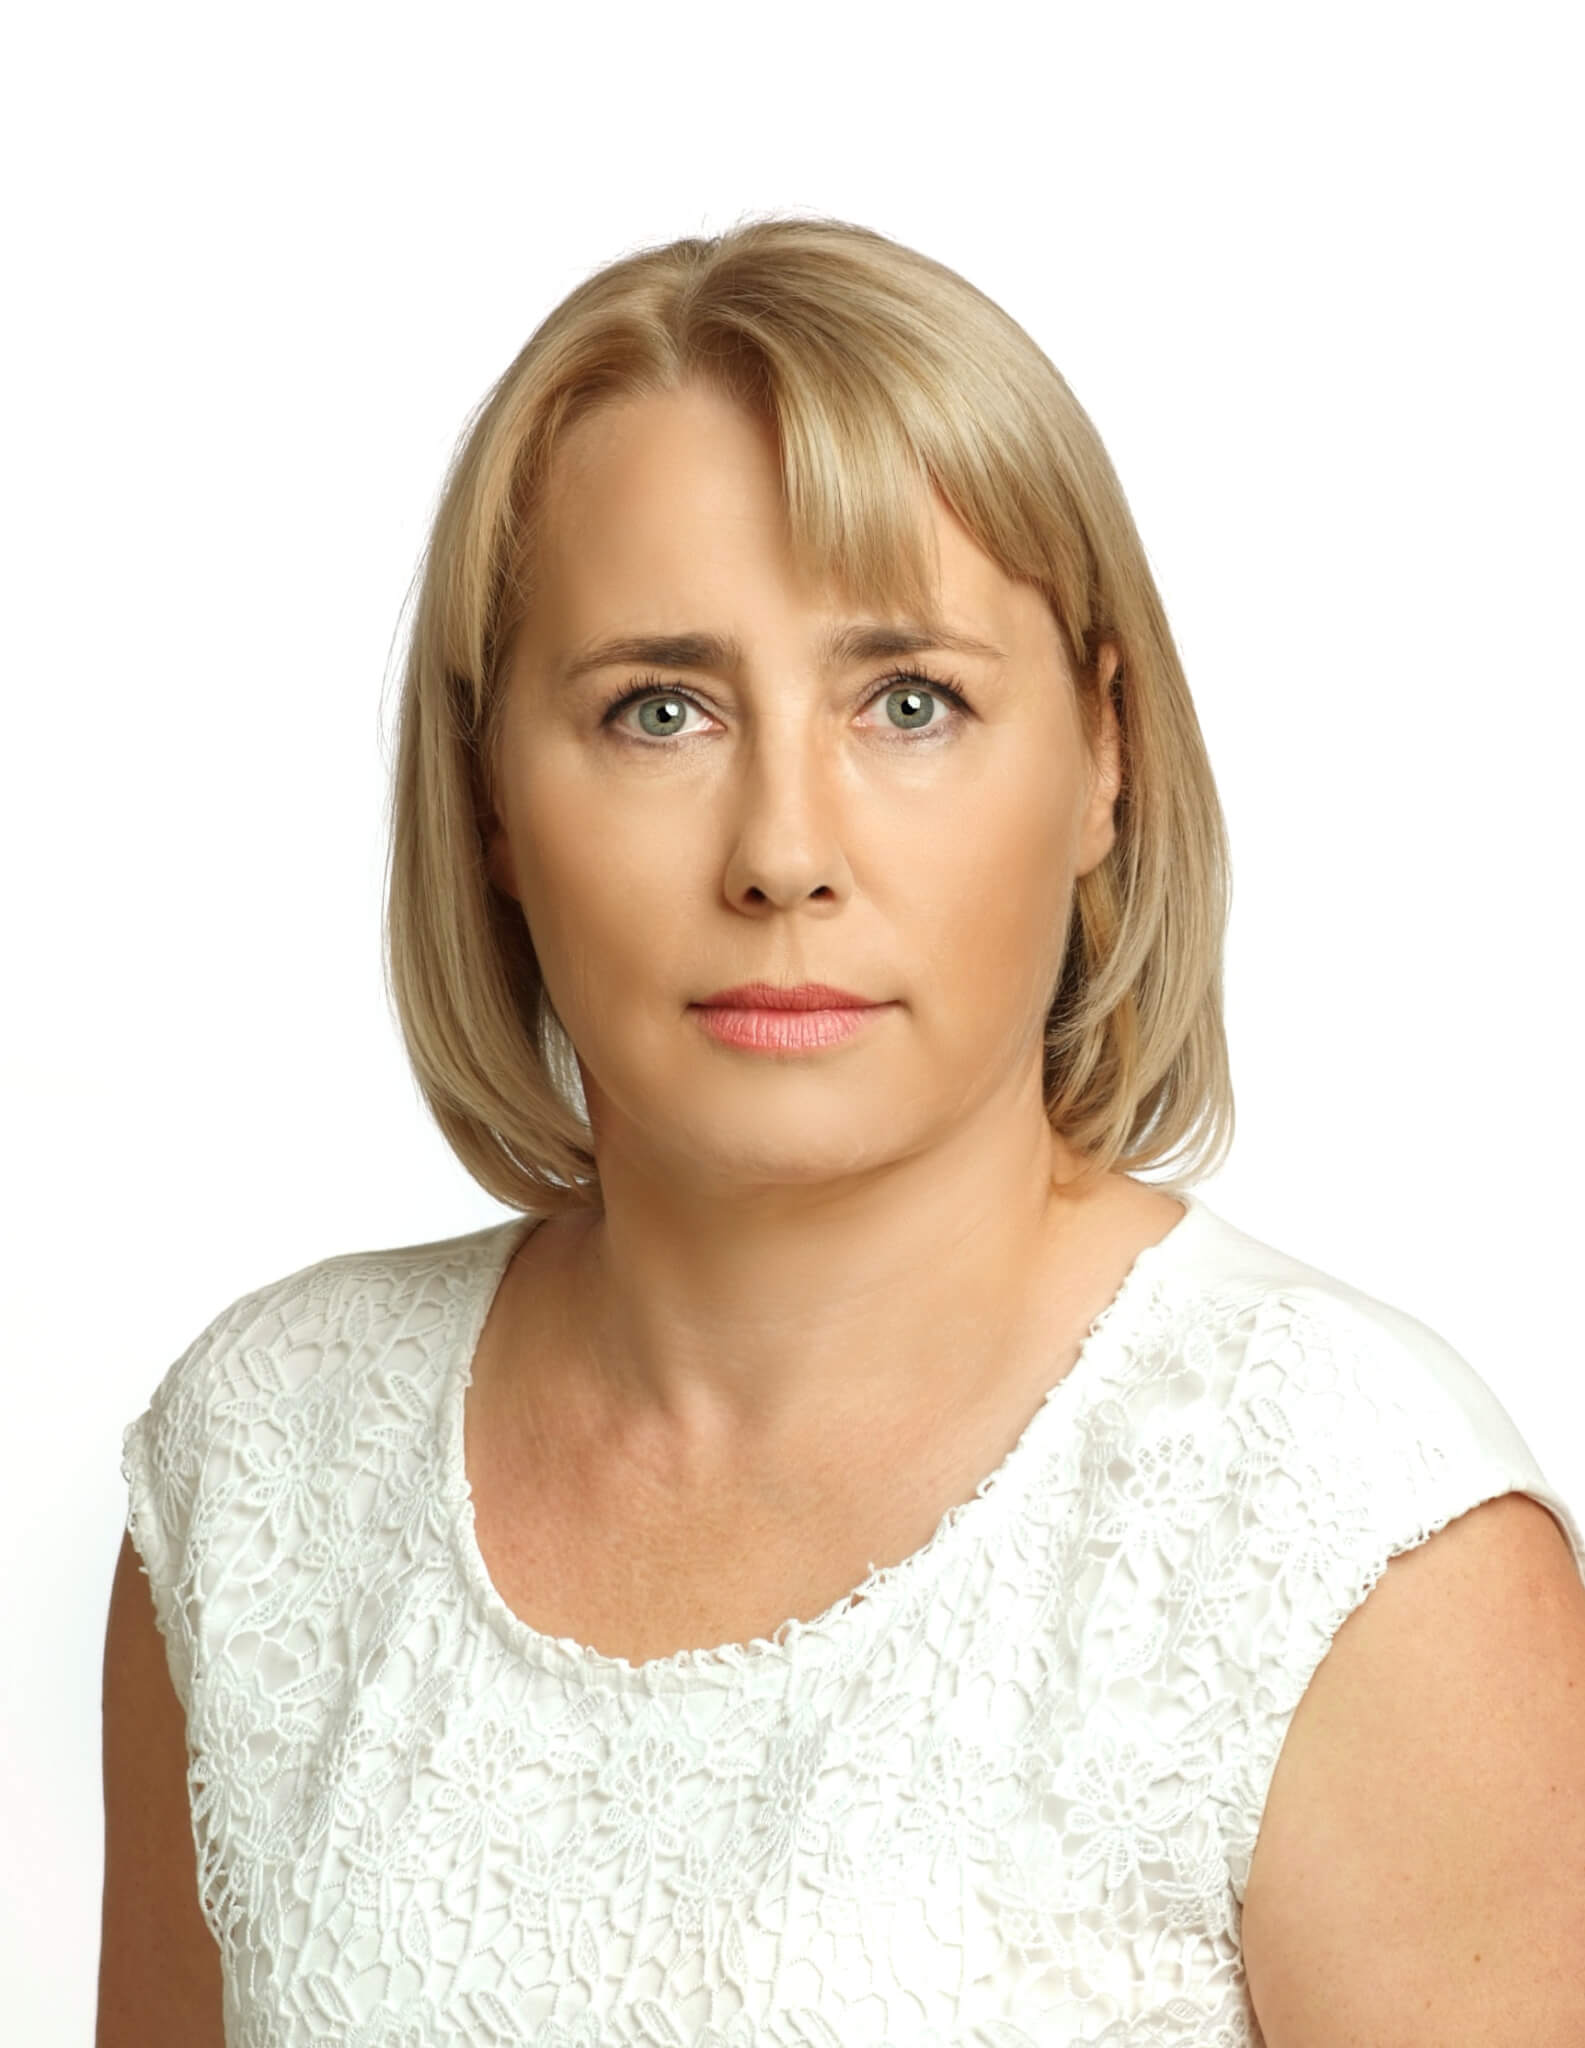 Aleksandra Kutrowska